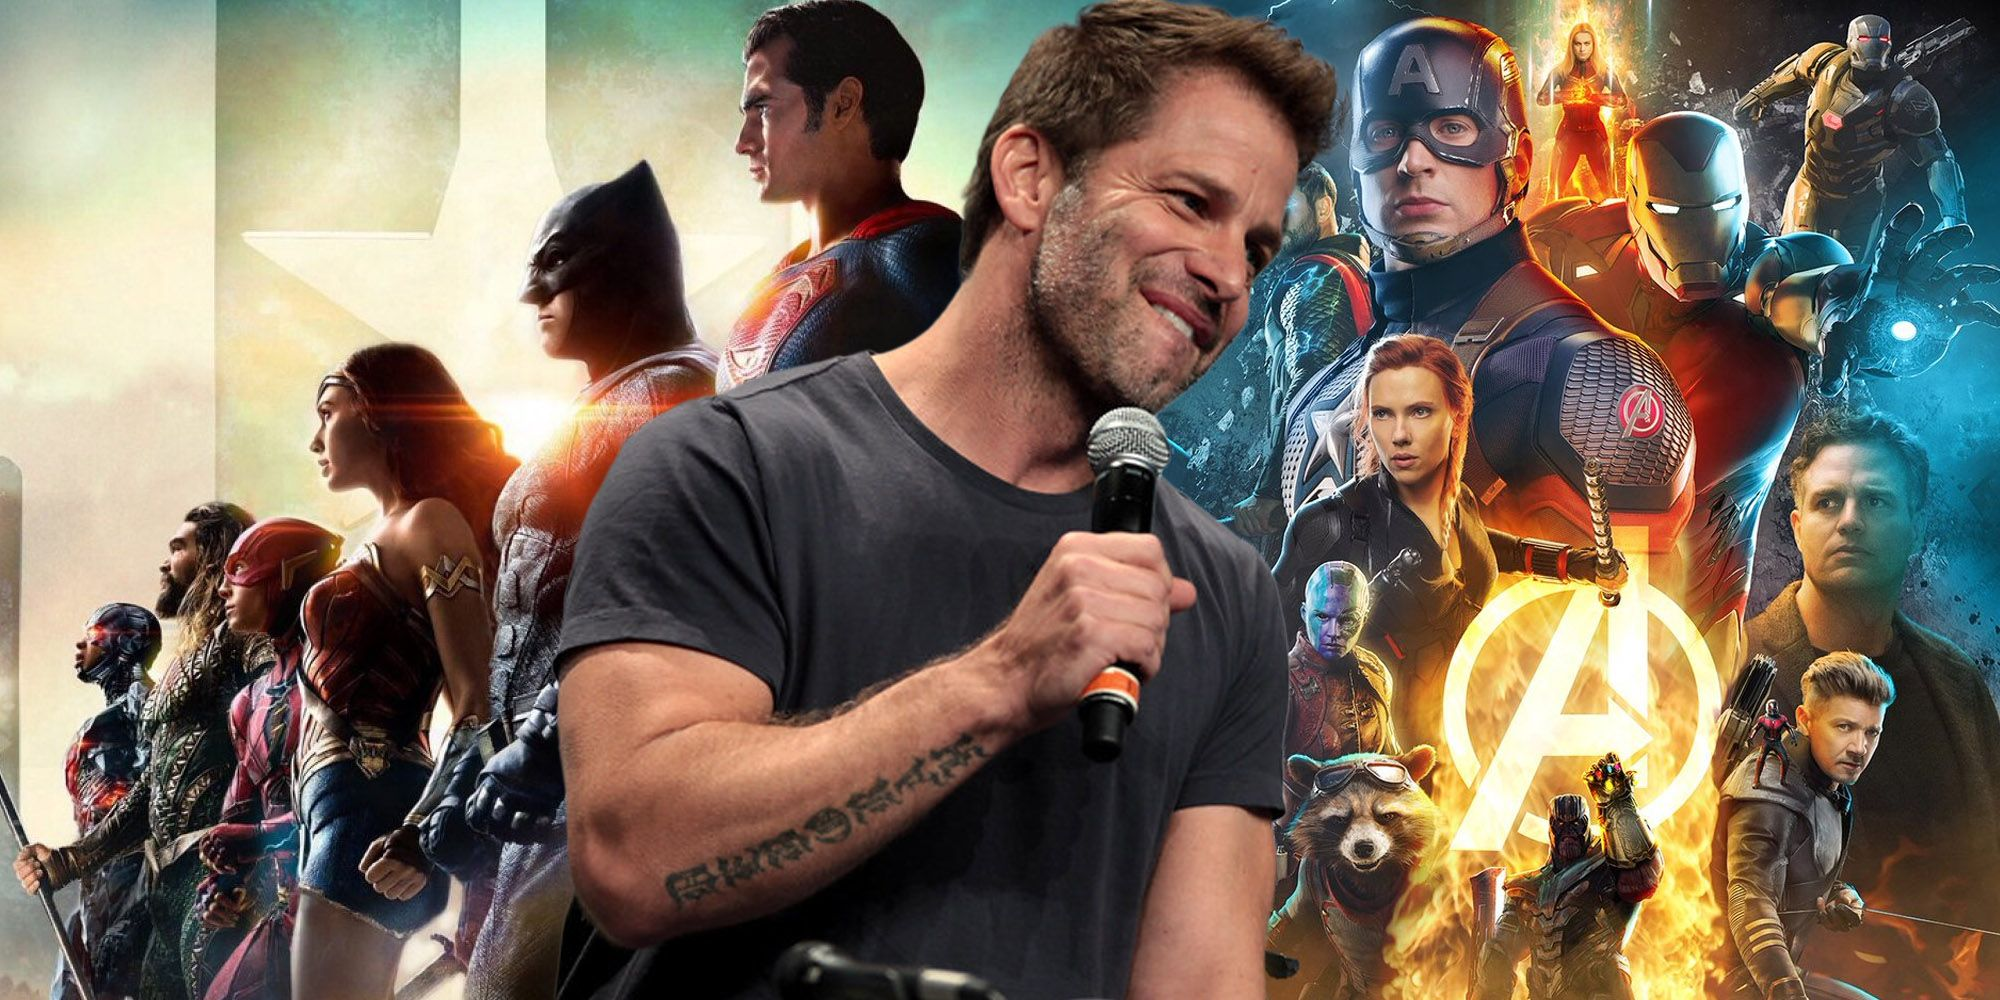 Zack Snyder Hints Making Movie Based on Anime